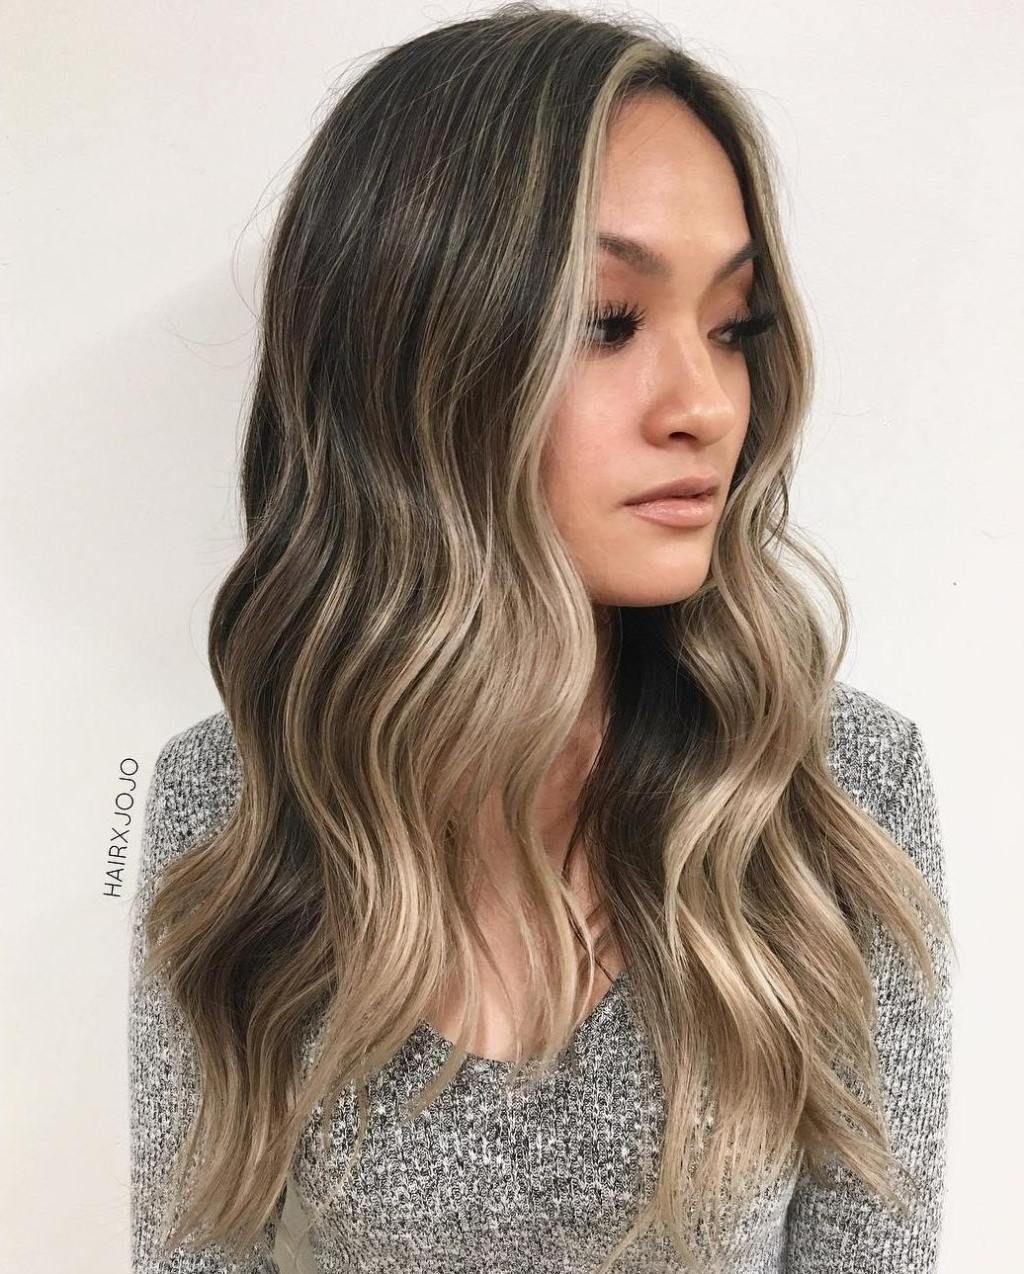 20 Best Face Framing Highlights For Every Face Shape Ash Blonde Balayage Balayage Hair Ash Blonde Balayage